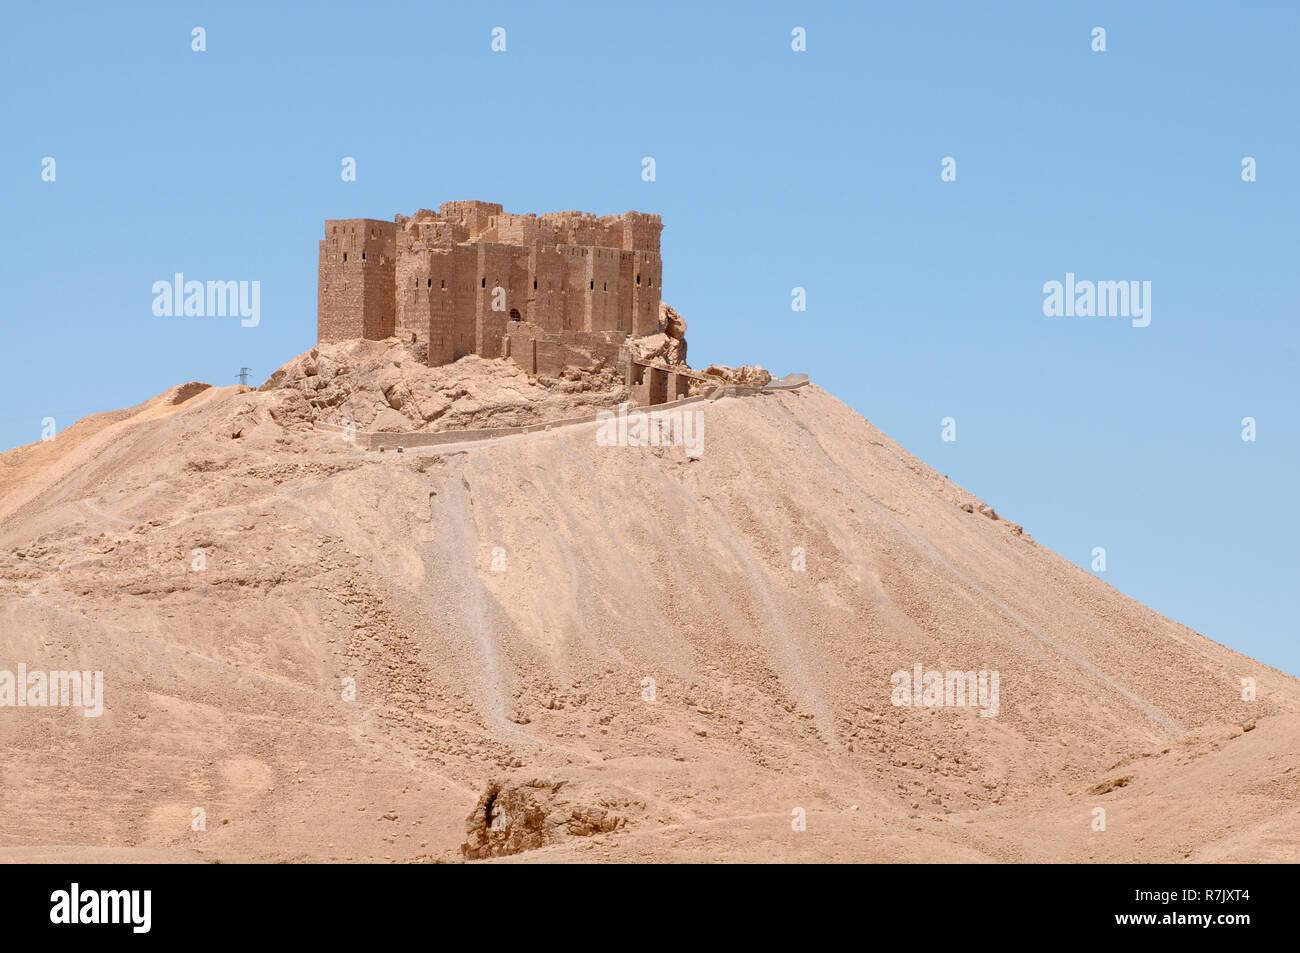 Fakhr-al-Din al-Maani Castle, a medieval Arab fortress, UNESCO World Heritage Site, Palmyra, Tadmur, Palmyra District Stock Photo